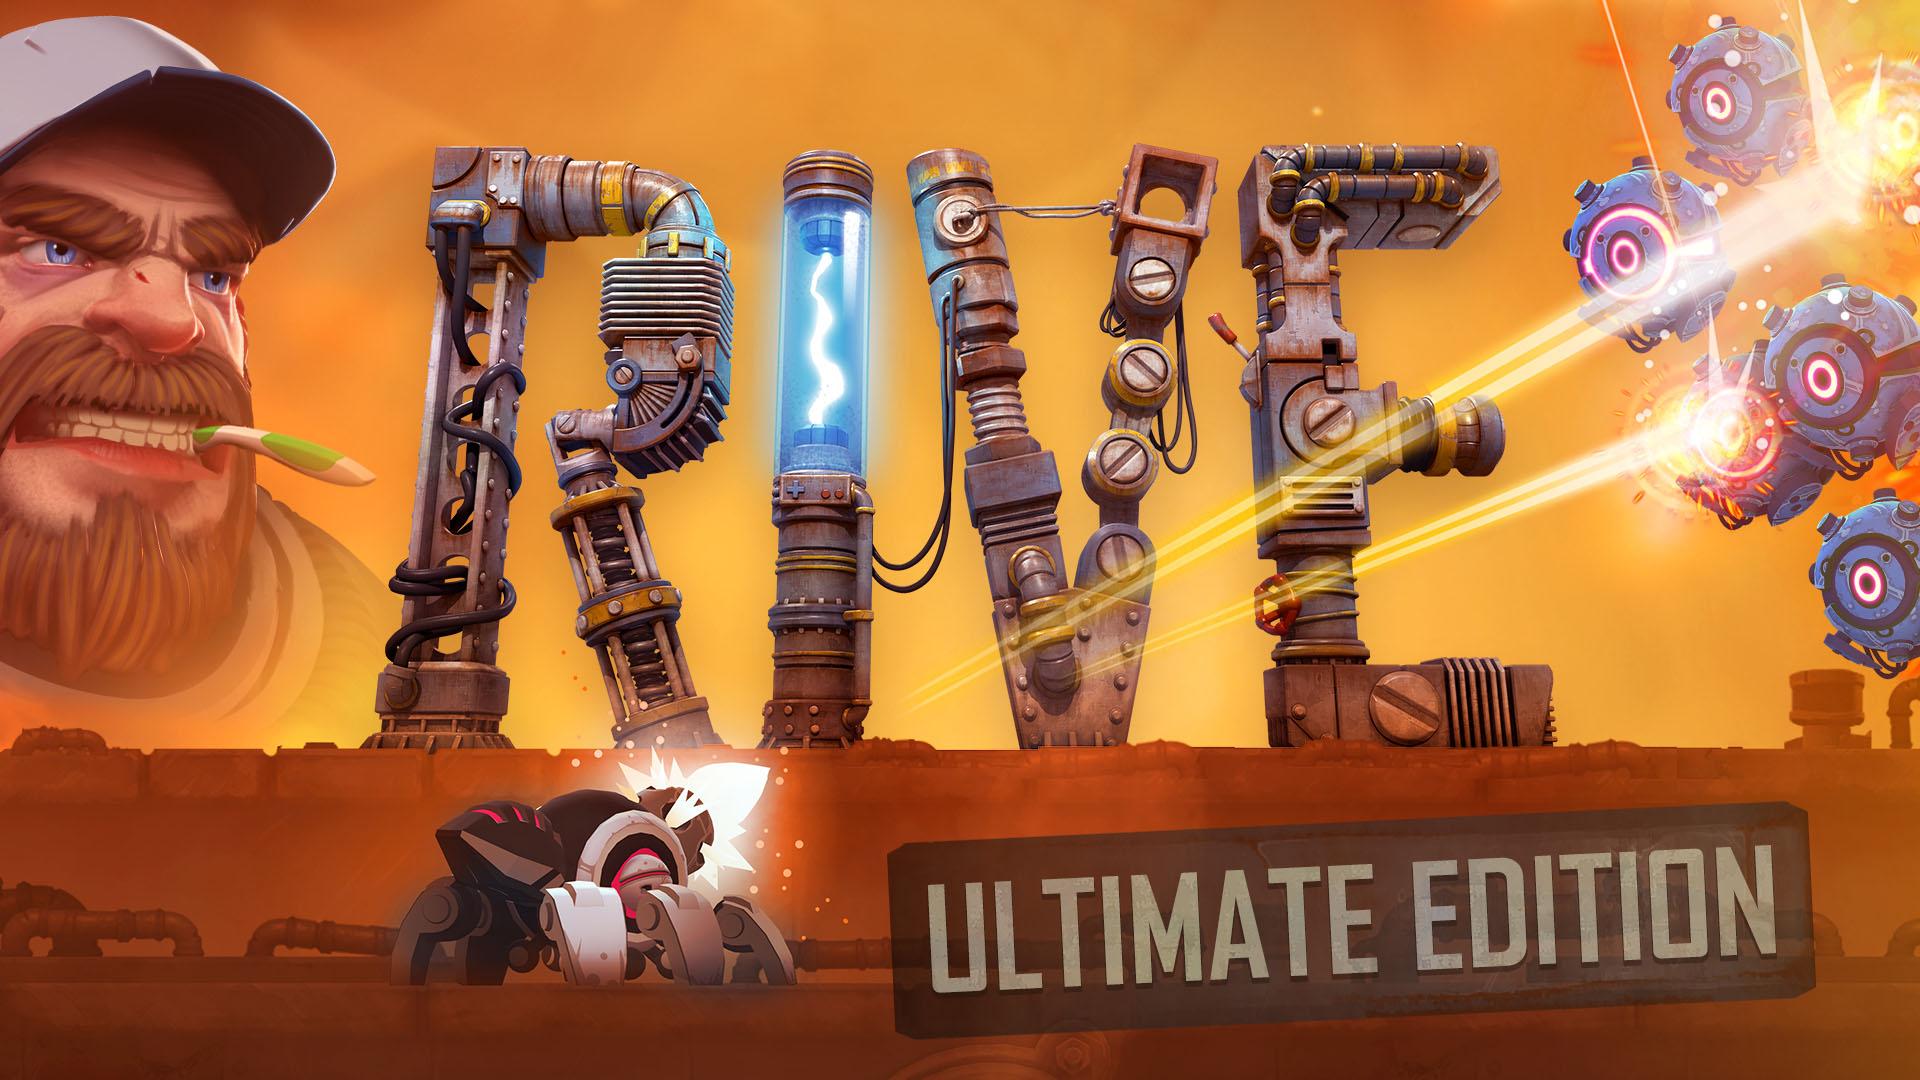 [Nintendo Switch] RIVE: Ultimate Edition £1.20 @ Nintendo eShop US (82p Mexico)